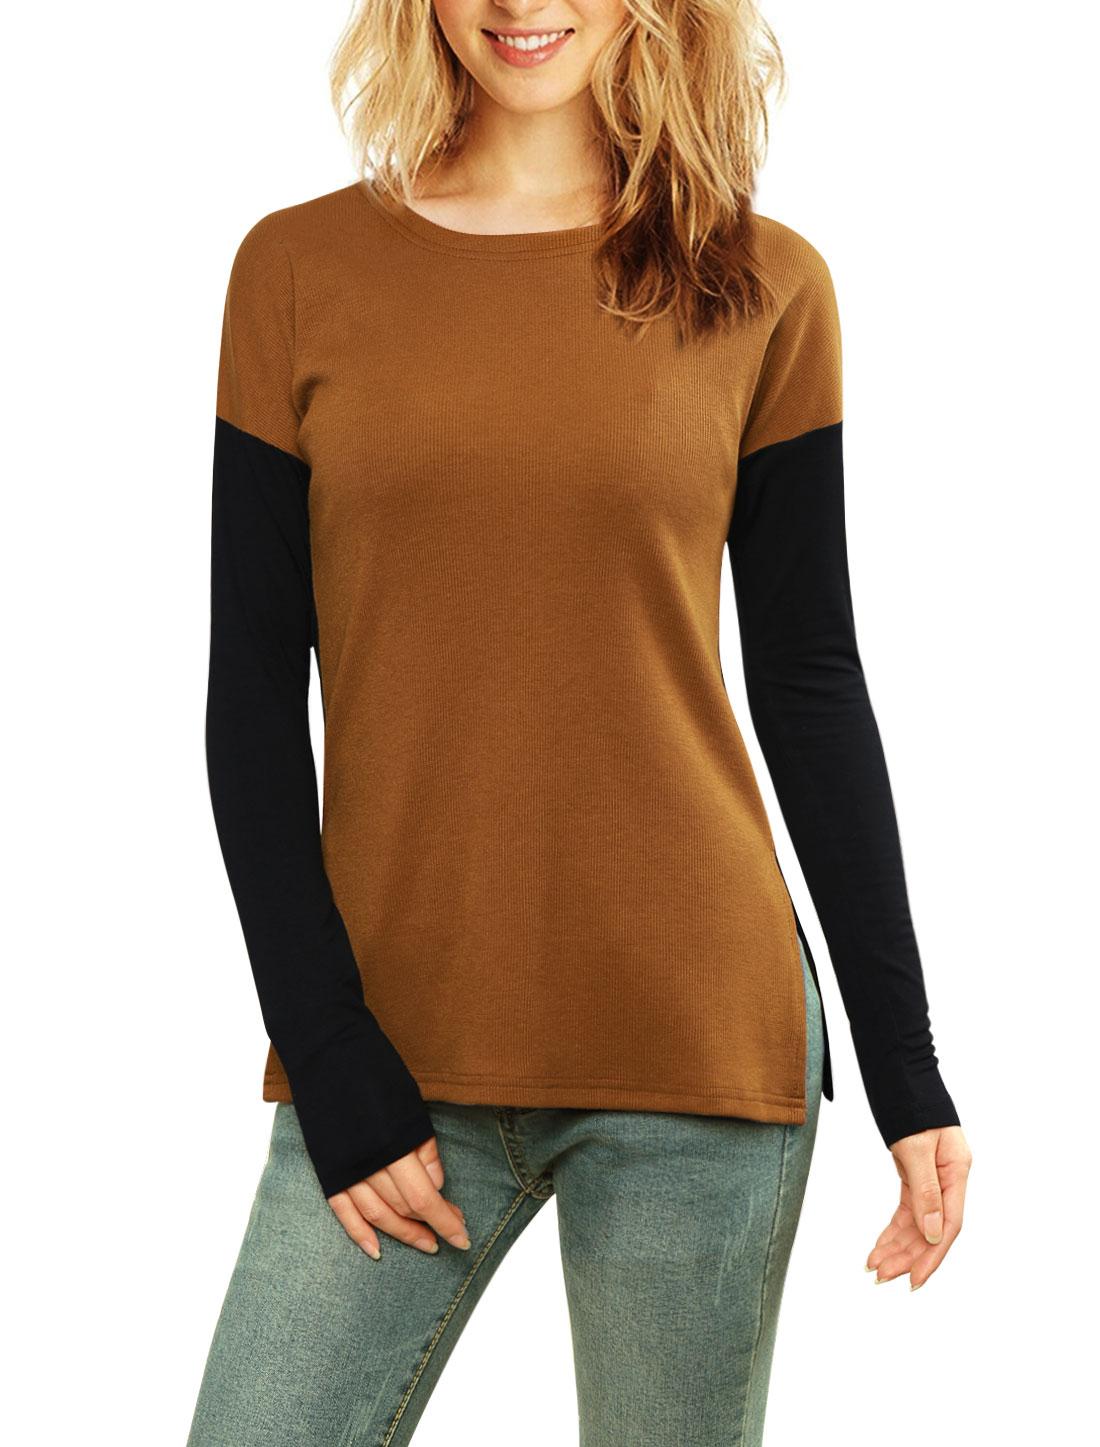 Women Color Block Side-Slit Paneled Slim Fit Ribbed Top Brown XL